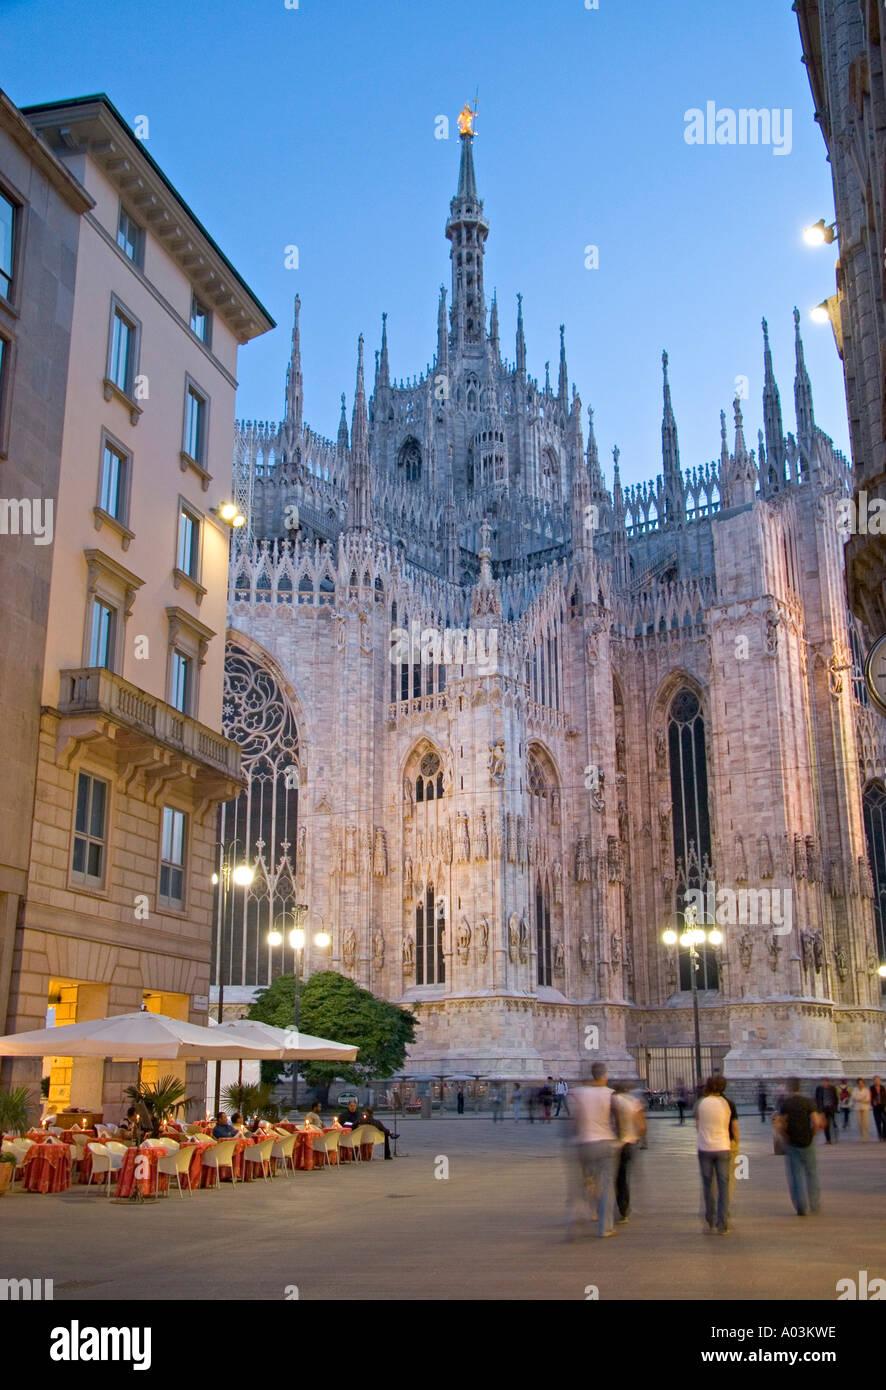 Duomo, Milan, Lombardy, Italy - Stock Image